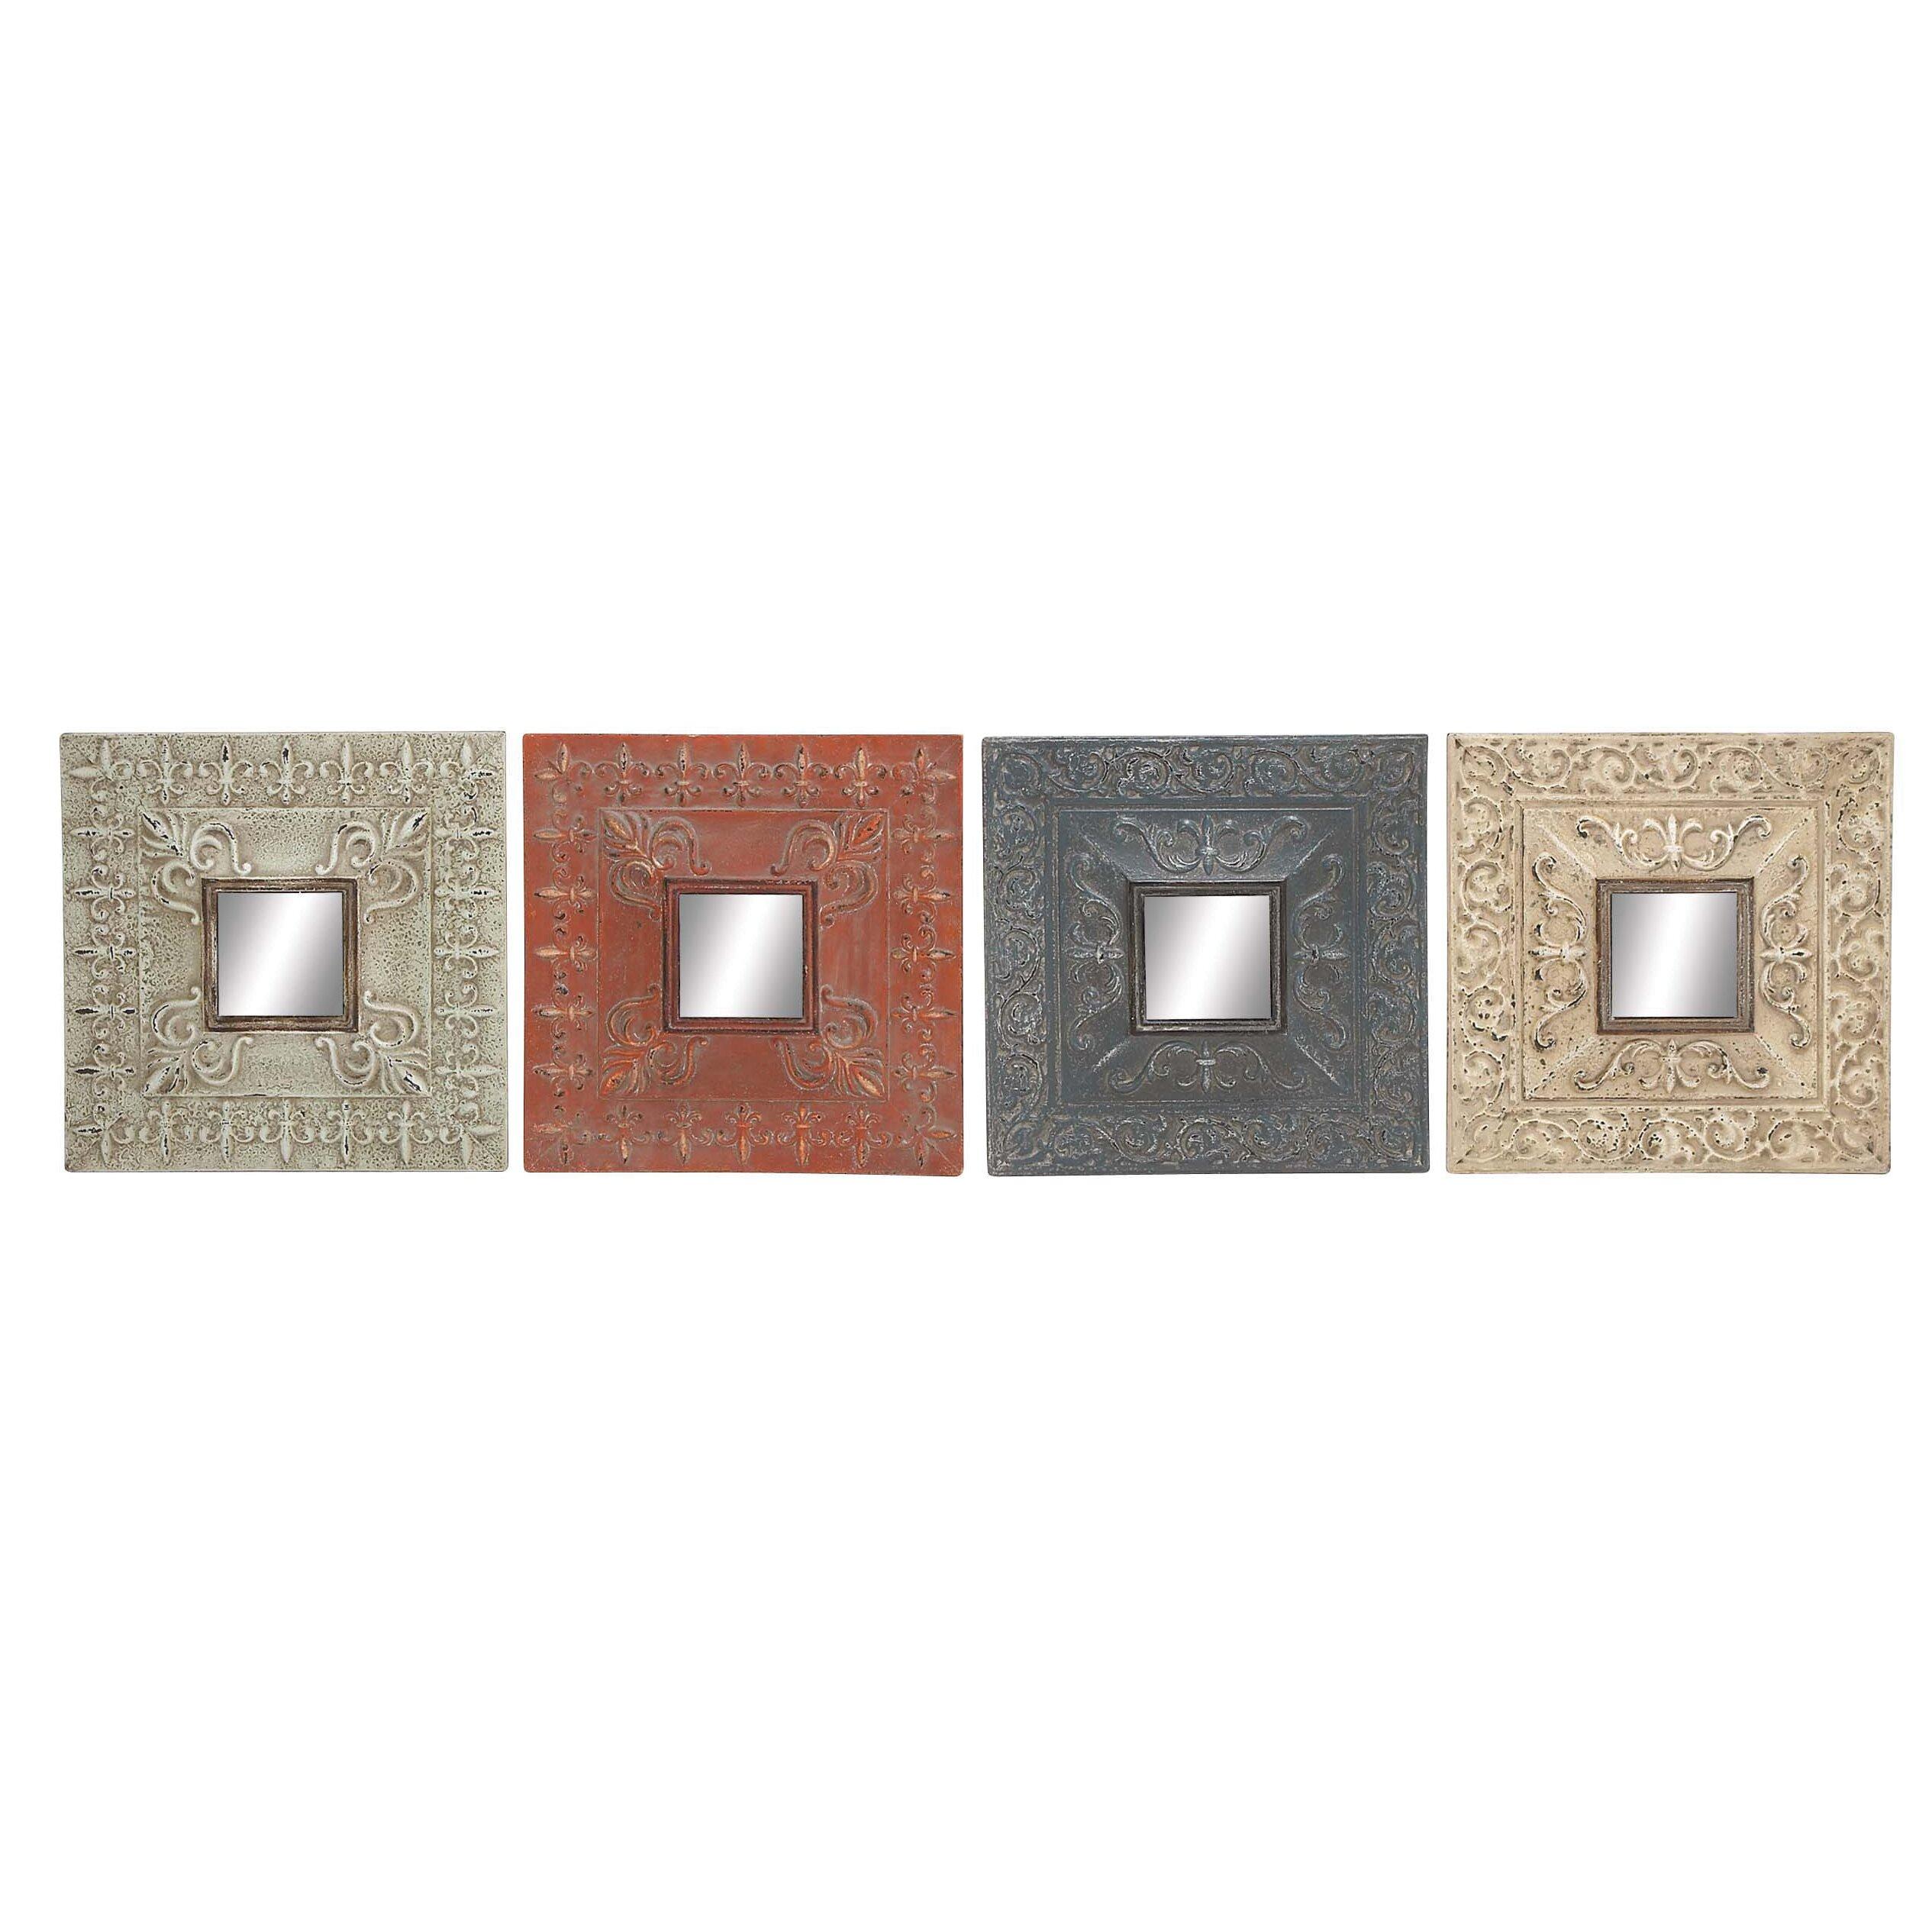 4 Piece Giolla Wall Decor Set : Cole grey piece metal mirror wall decor set reviews